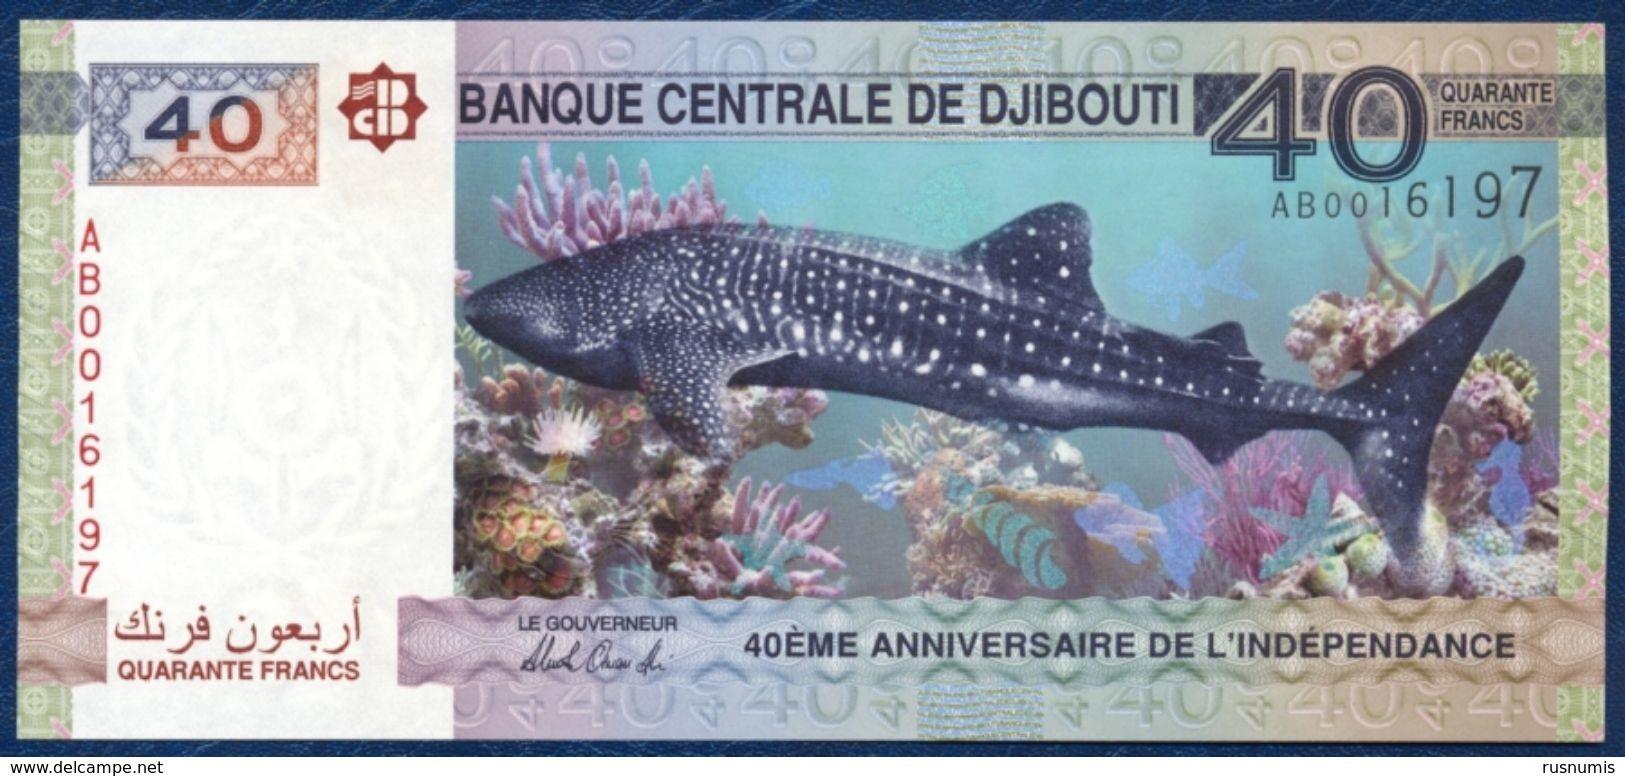 DJIBOUTI 40 FRANCS P-NEW  40th ANNIVERSARY OF INDEPENDENCE UNDERWATER FAUNA FISH 2017 UNC - Djibouti